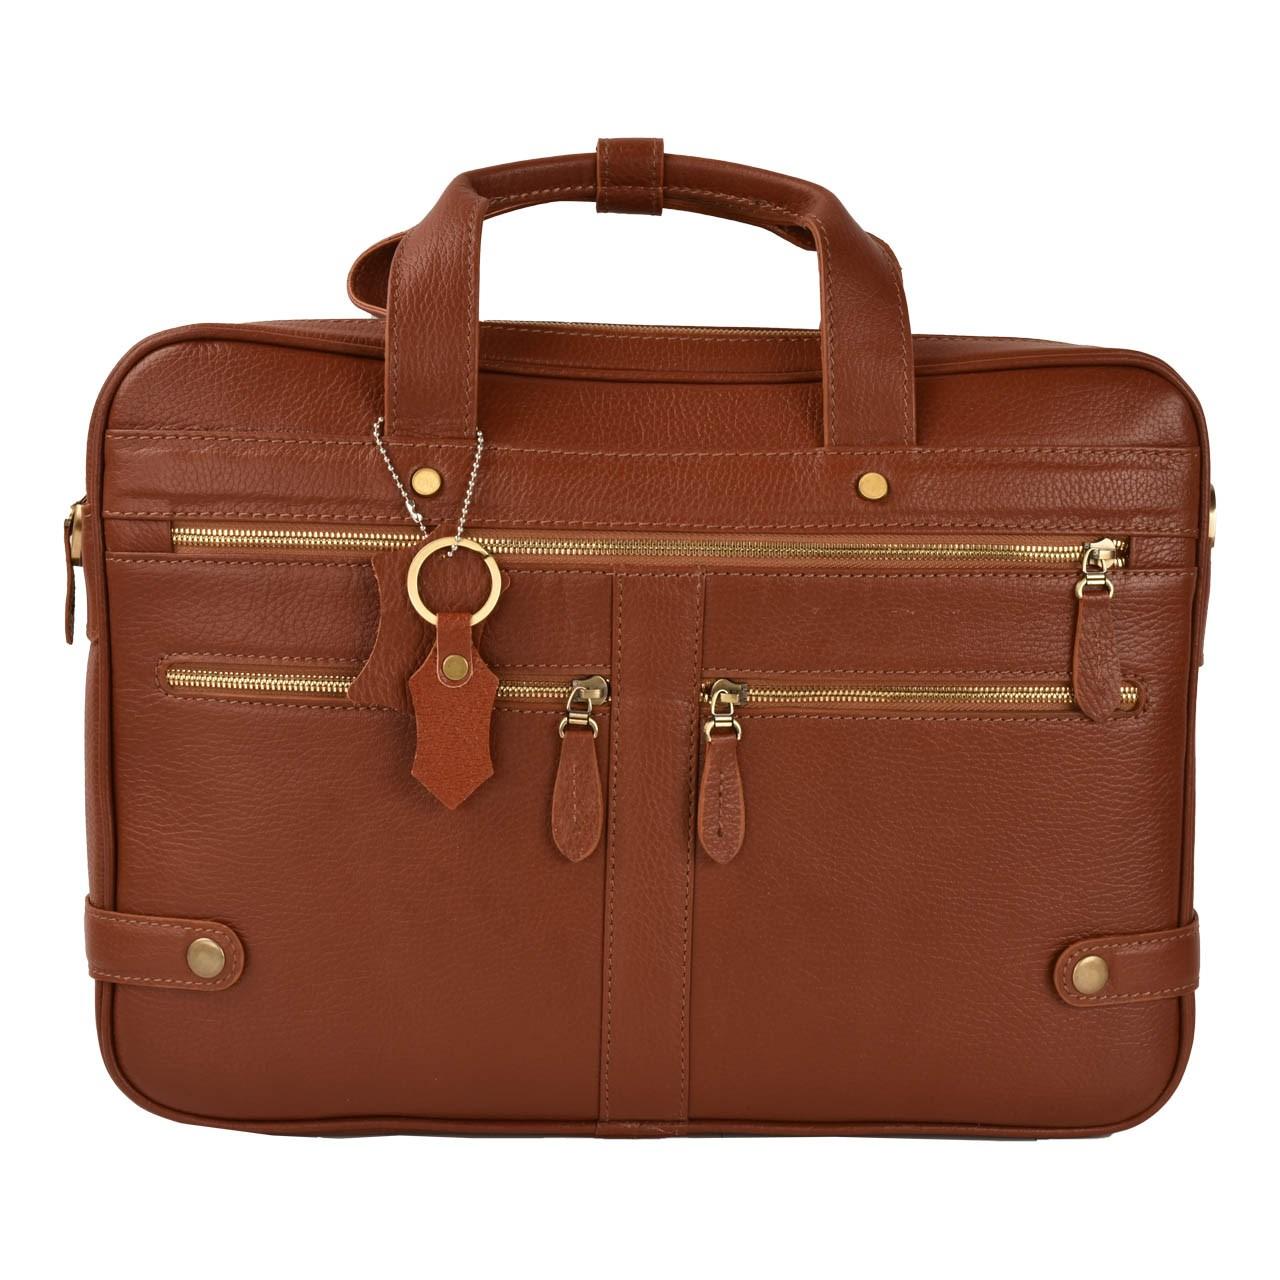 کیف اداری چرم طبیعی کهن چرم مدل1 -L111